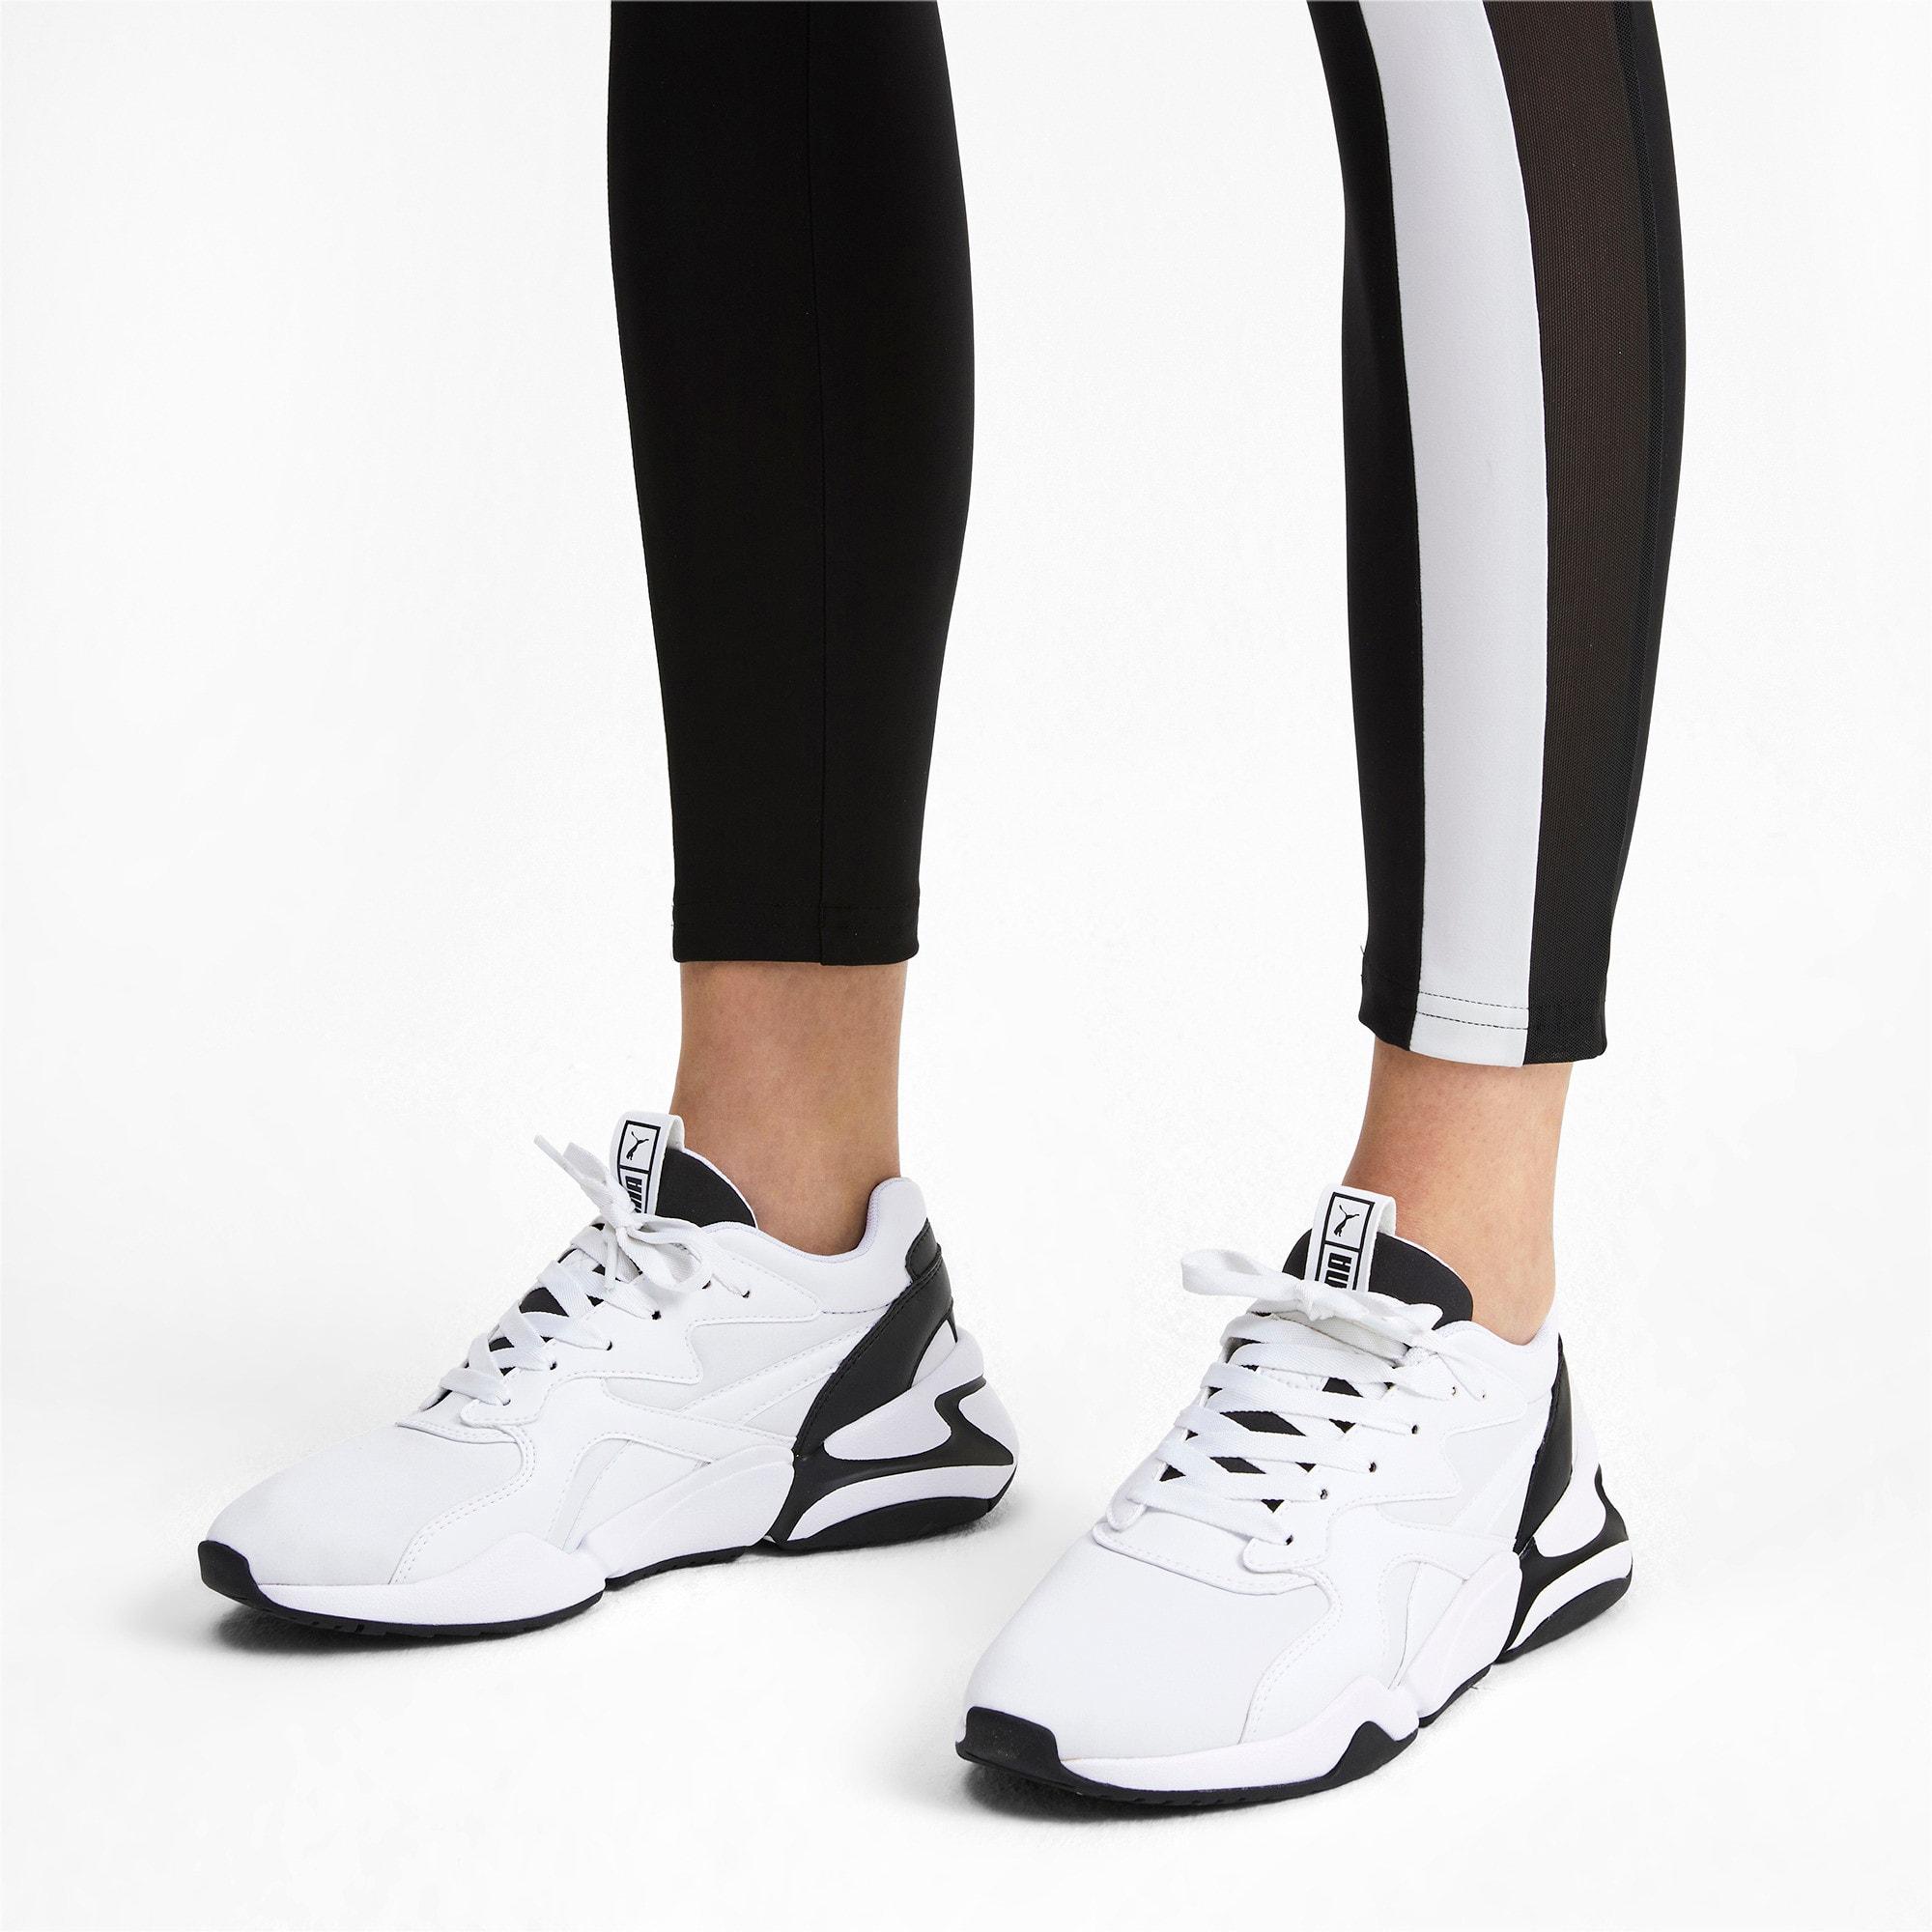 Thumbnail 2 of Nova Women's Sneakers, Puma White-Puma Black, medium